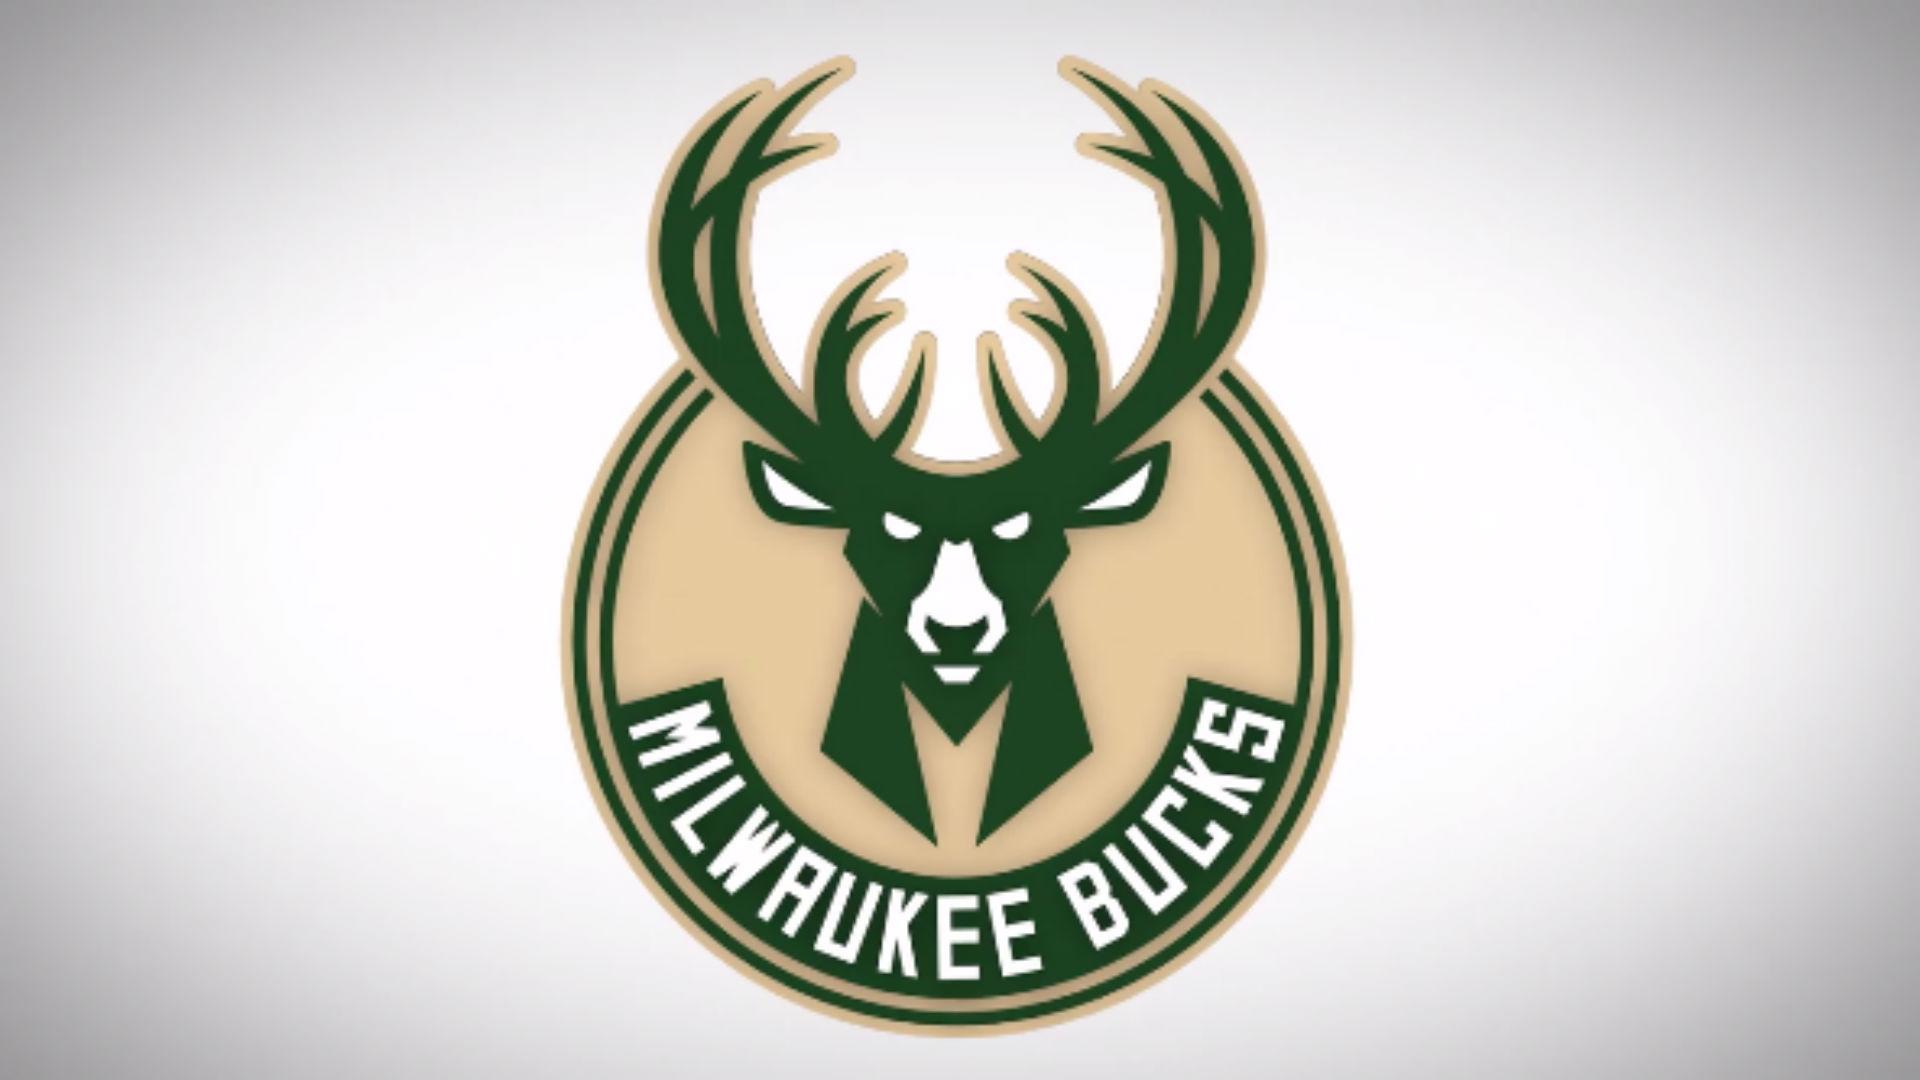 Il logo dei Bucks